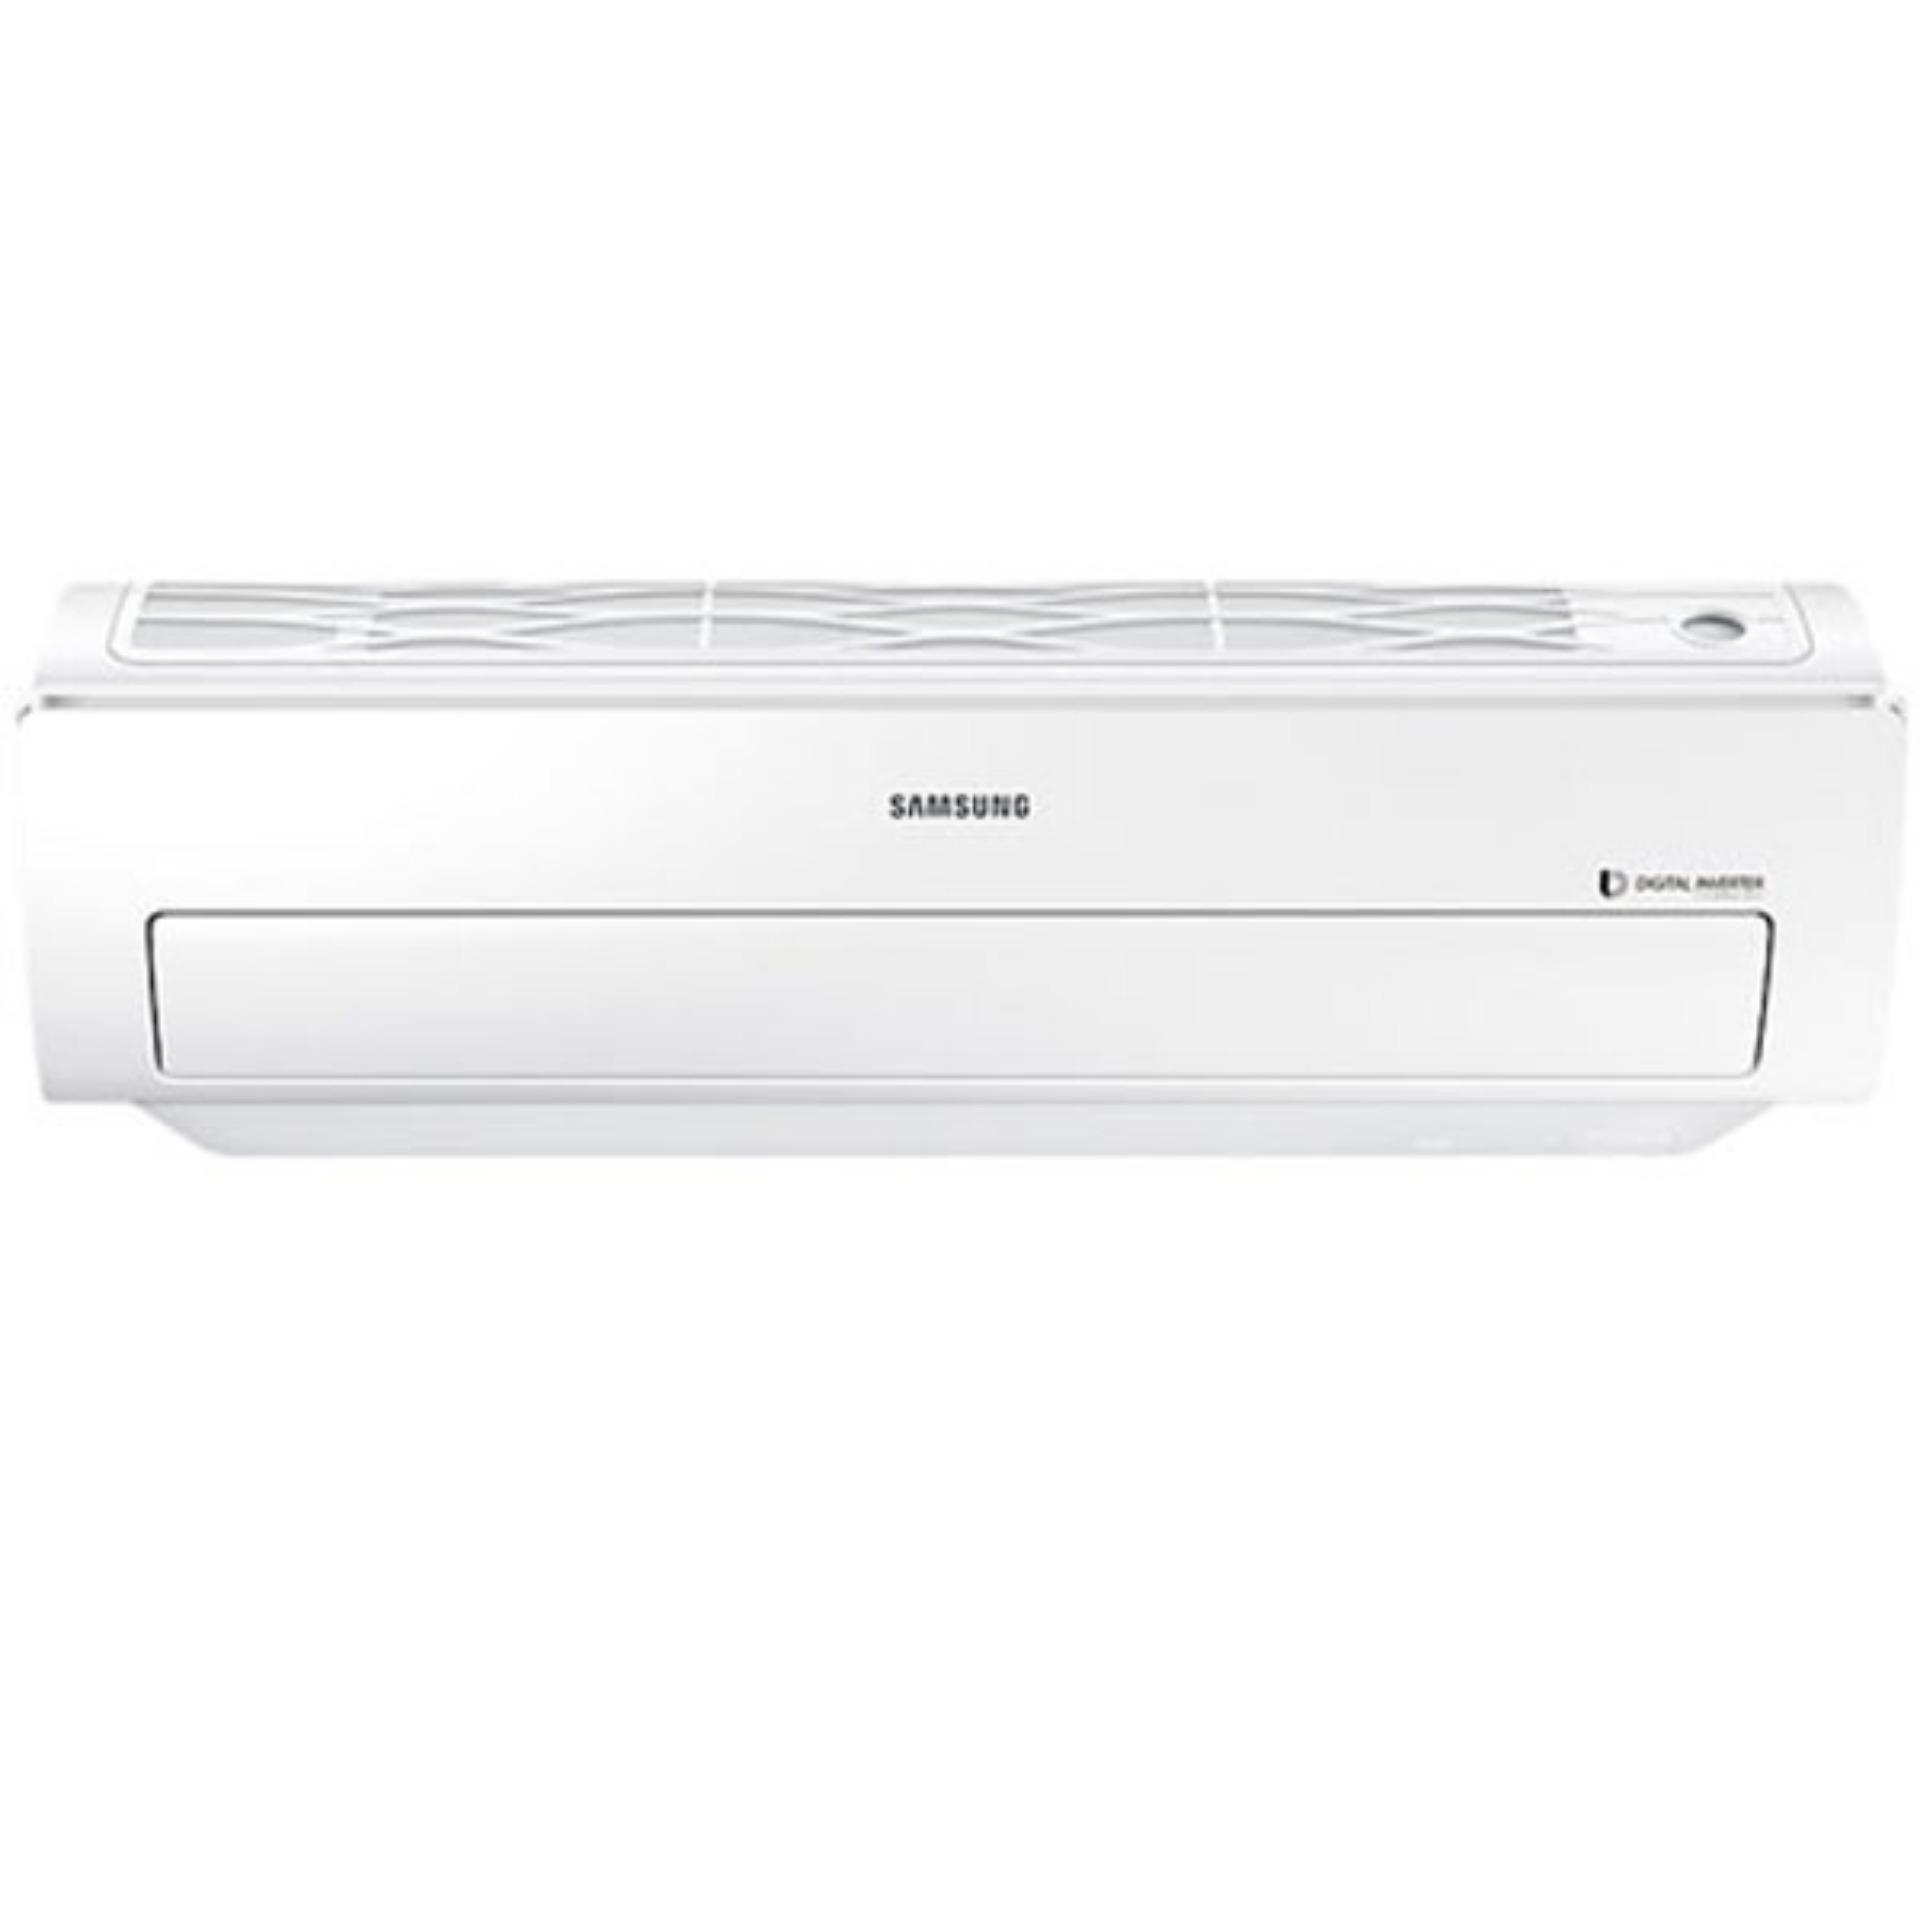 Máy lạnh Samsung Inverter 1 HP AR10MVFSBWKNSV